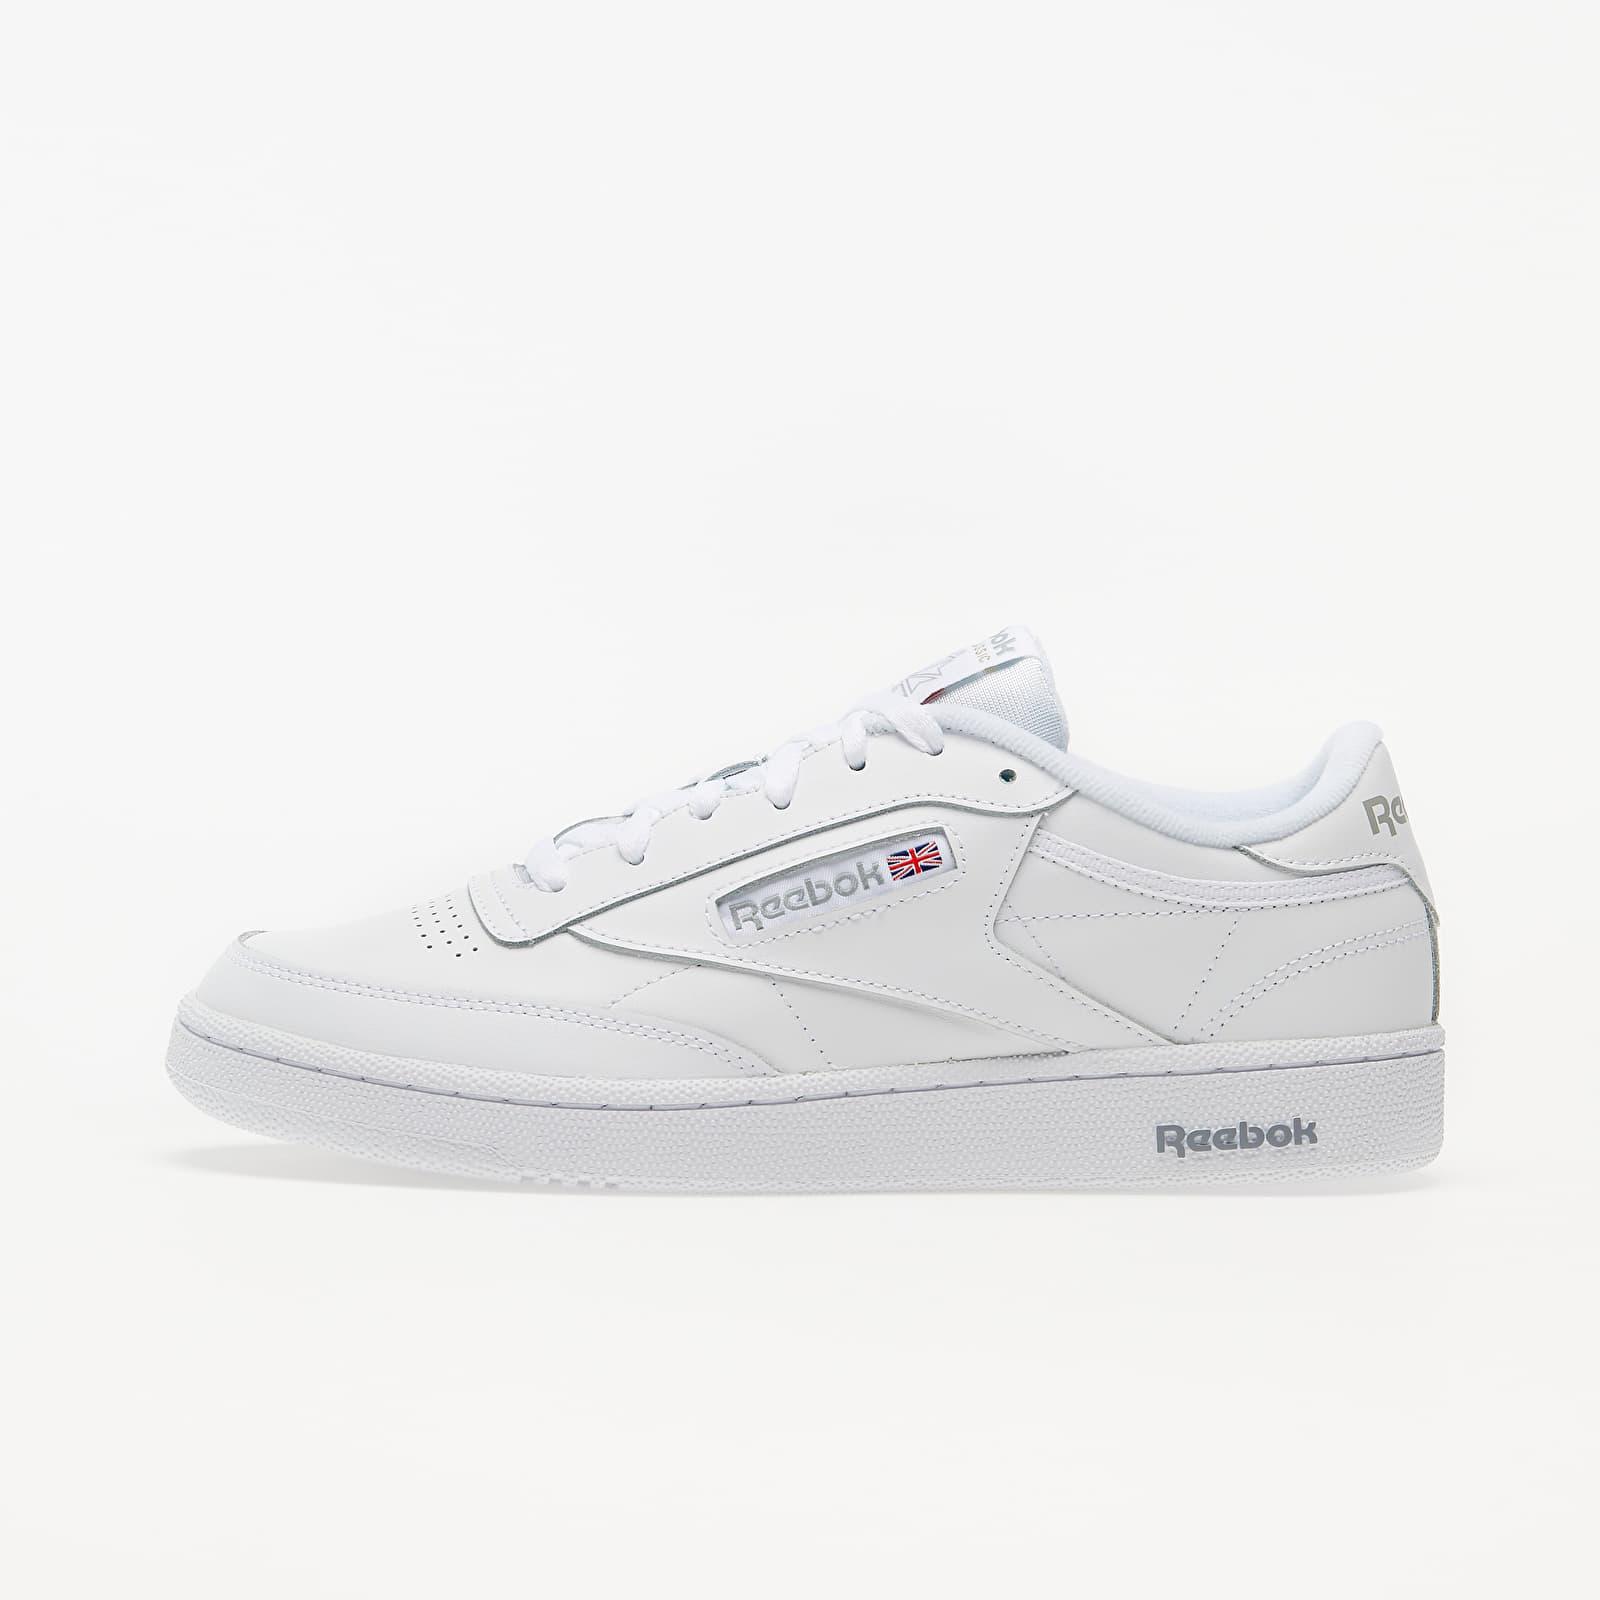 Reebok Club C 85 White/ Sheer Grey AR0455